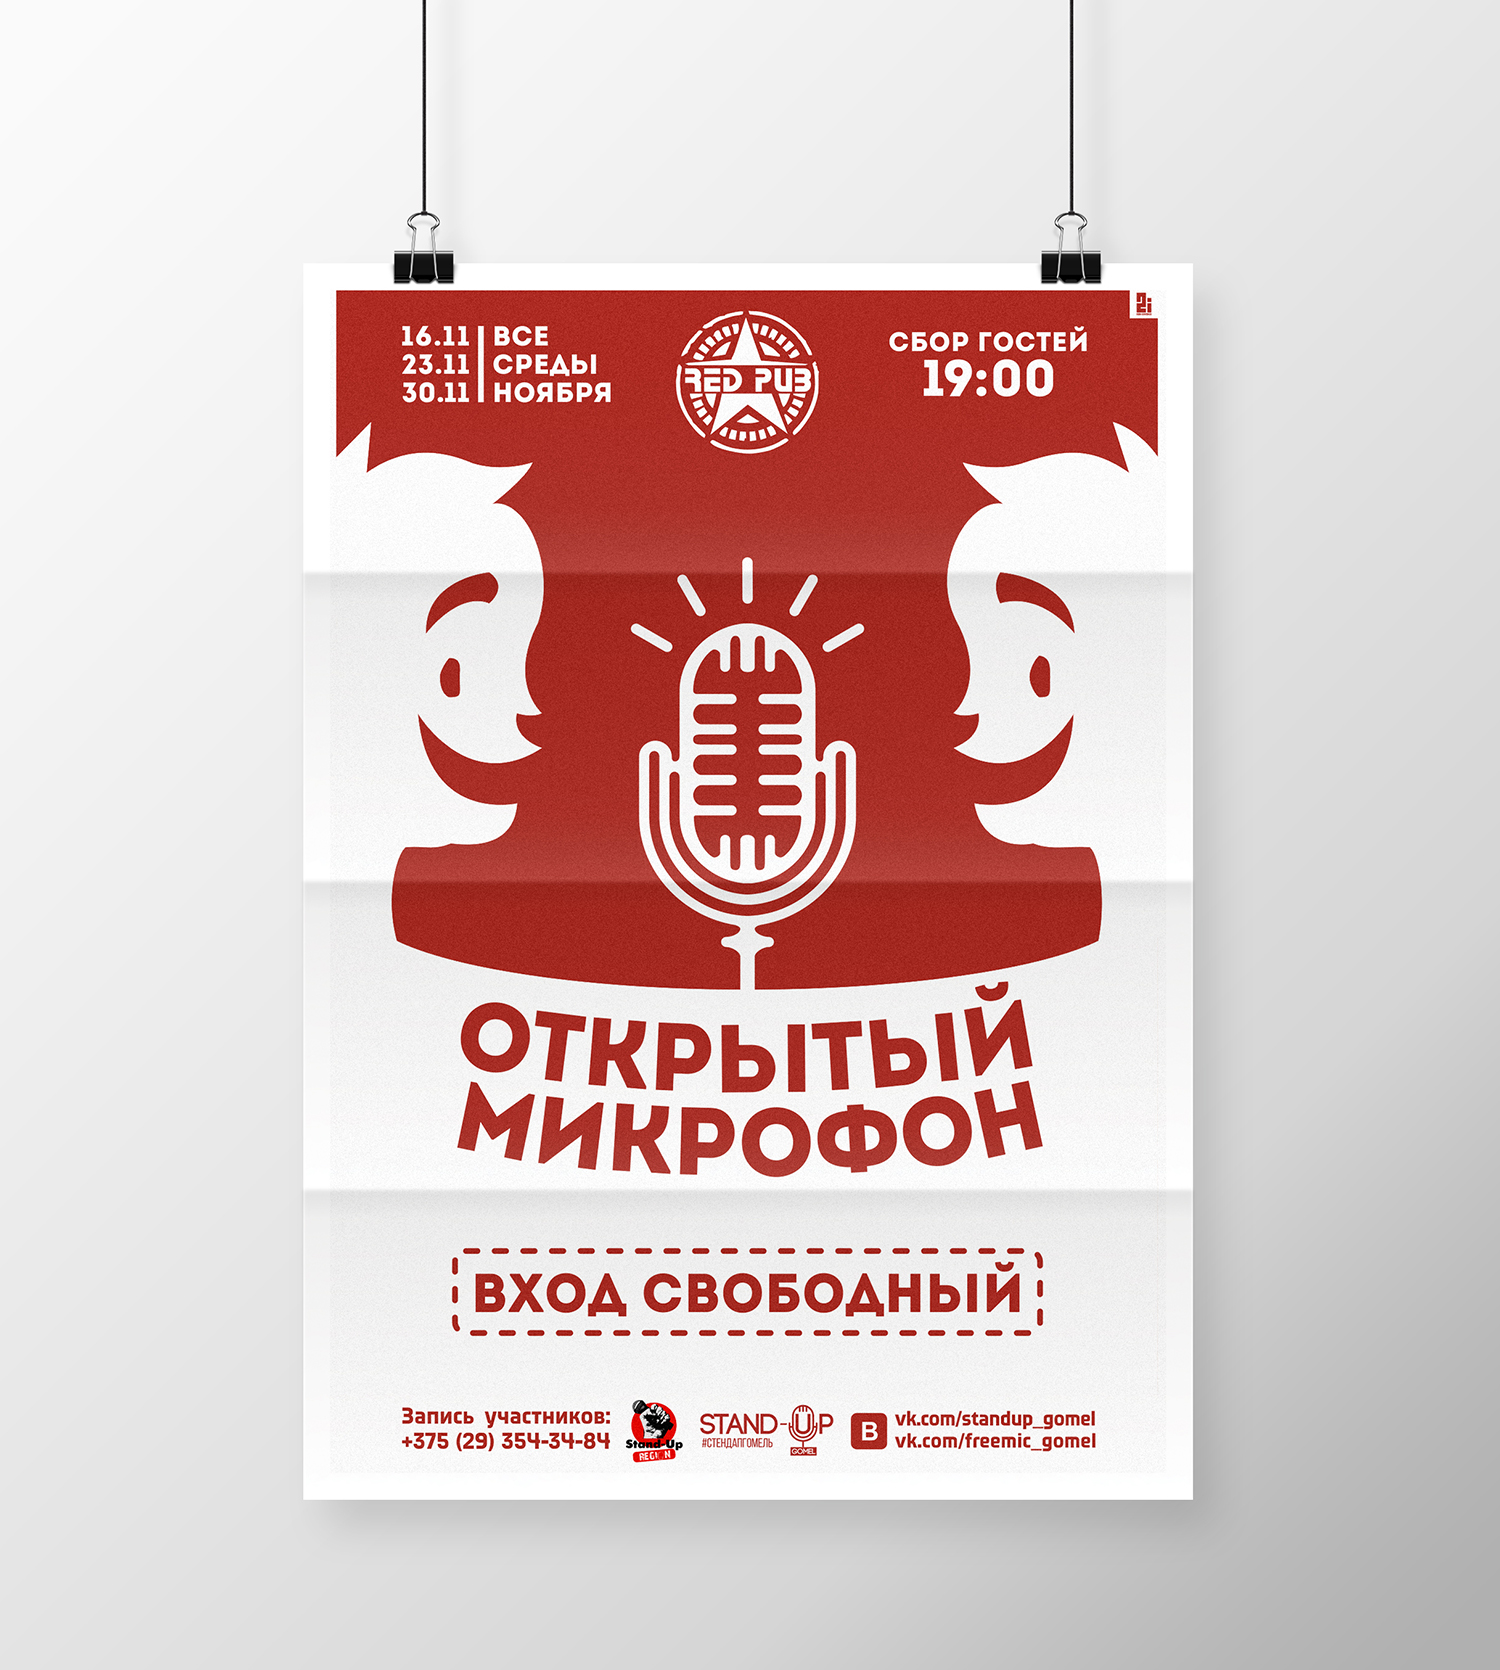 Афиша «Открытый микрофон» v2.0